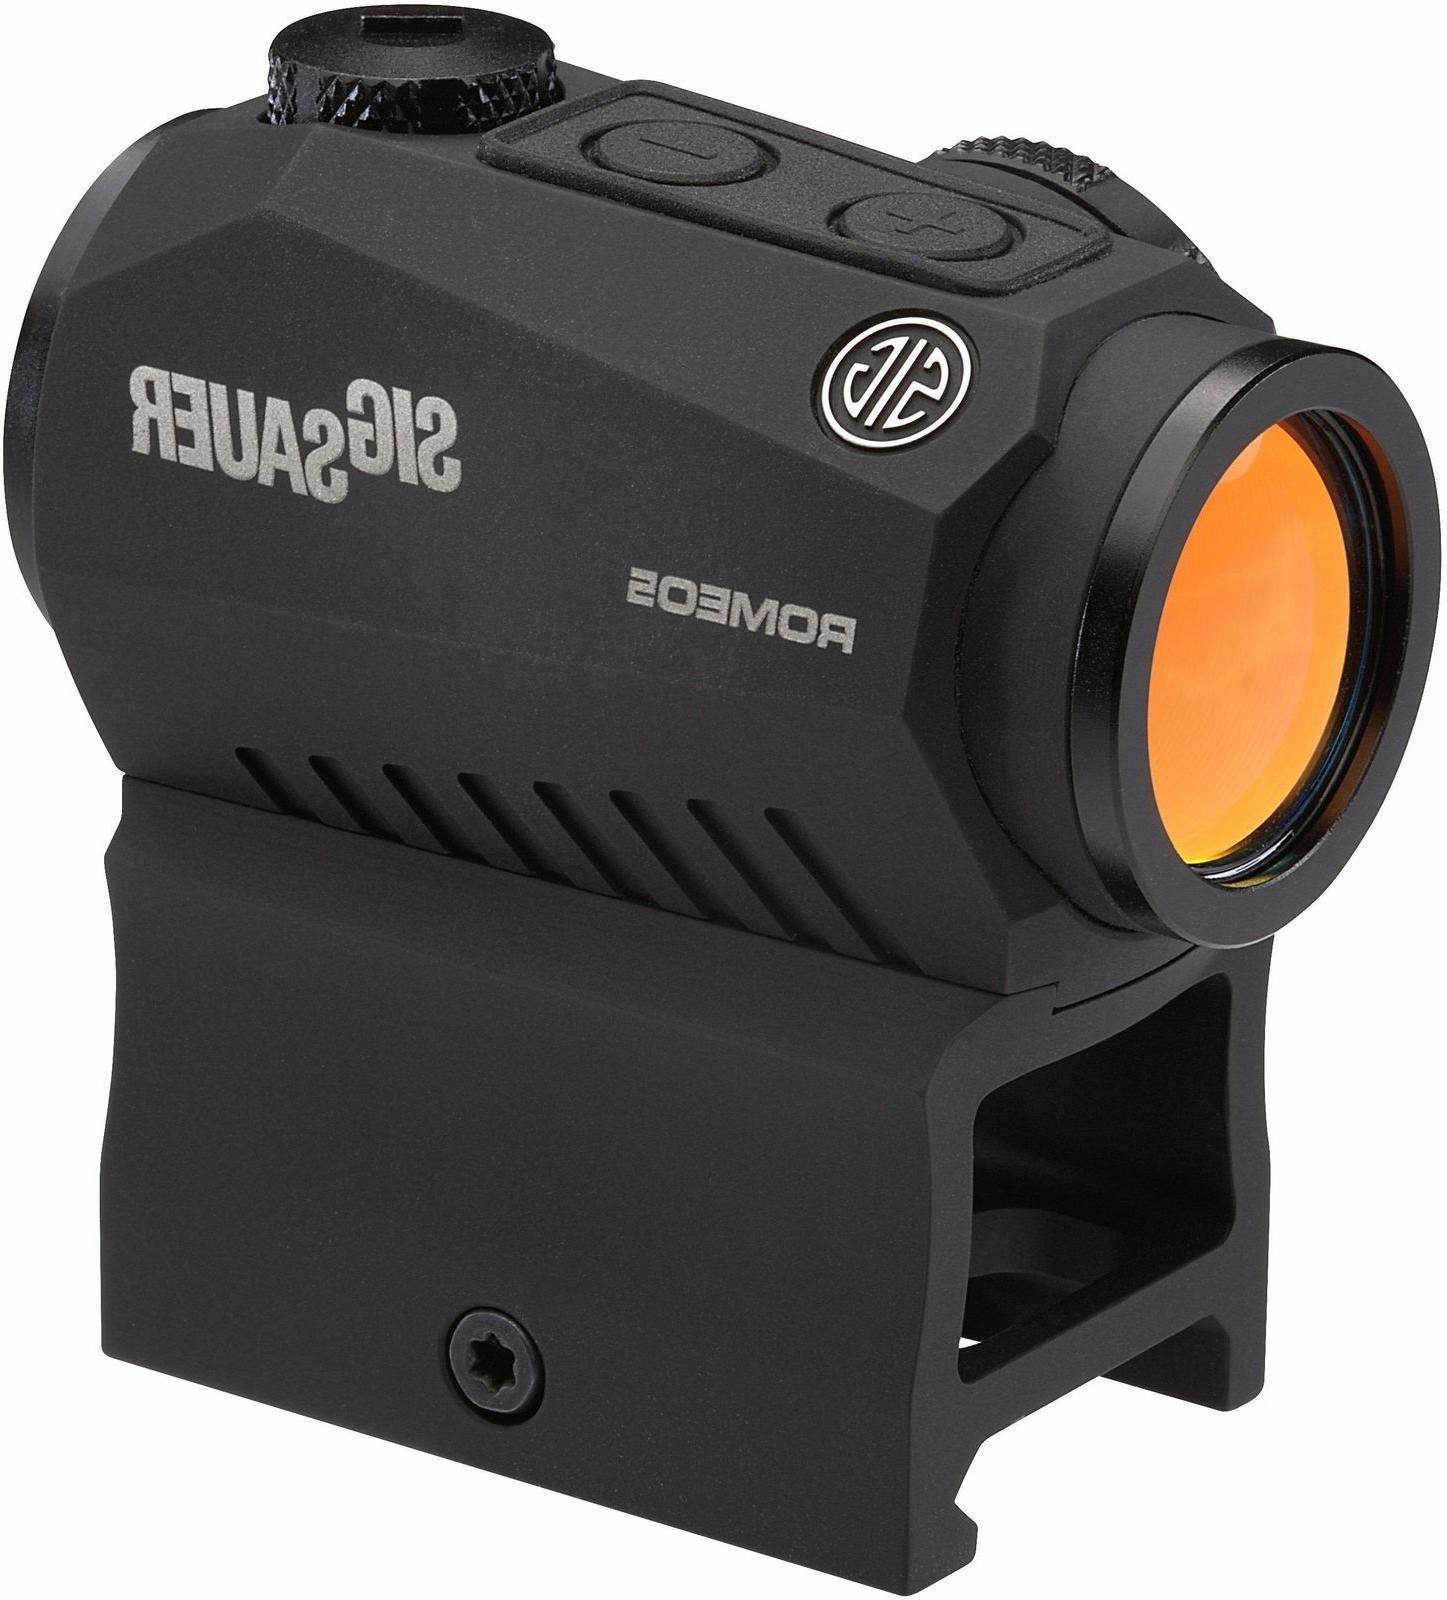 romeo5 compact red dot 1x20mm 2 moa